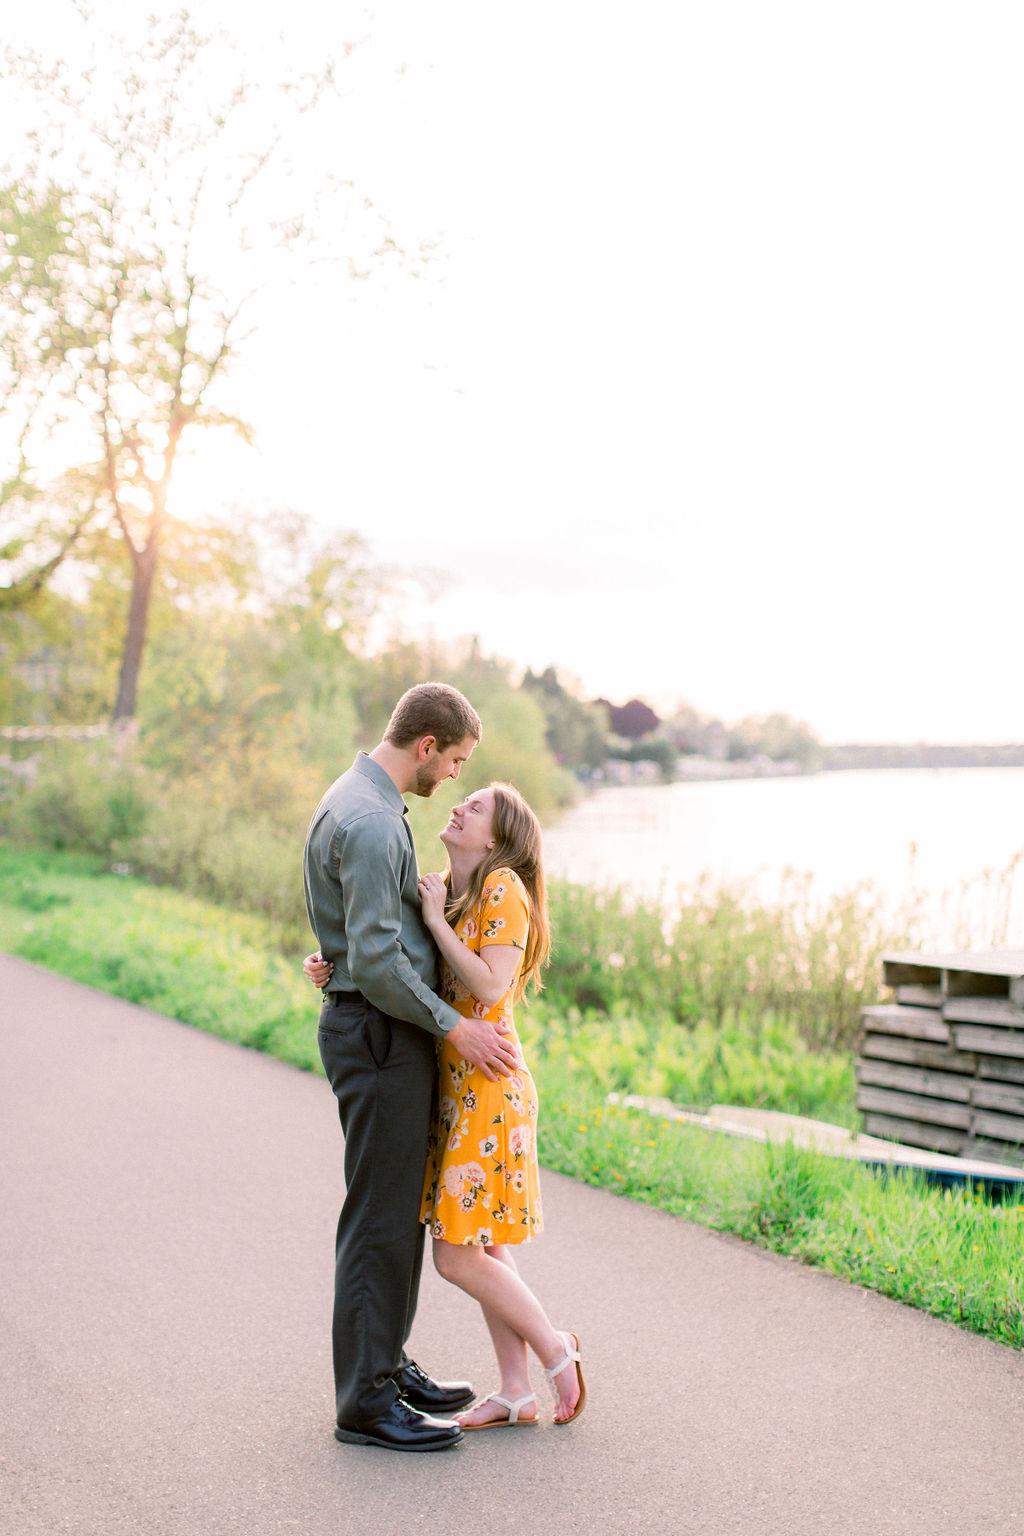 katie_graham_photography_luxury_destination_fine_art_wedding_photographer_bemus_point_chautauqua_institution_chautauqua_lake_mayville_lakewood_buffalo_new_york_erie_pennsylvania